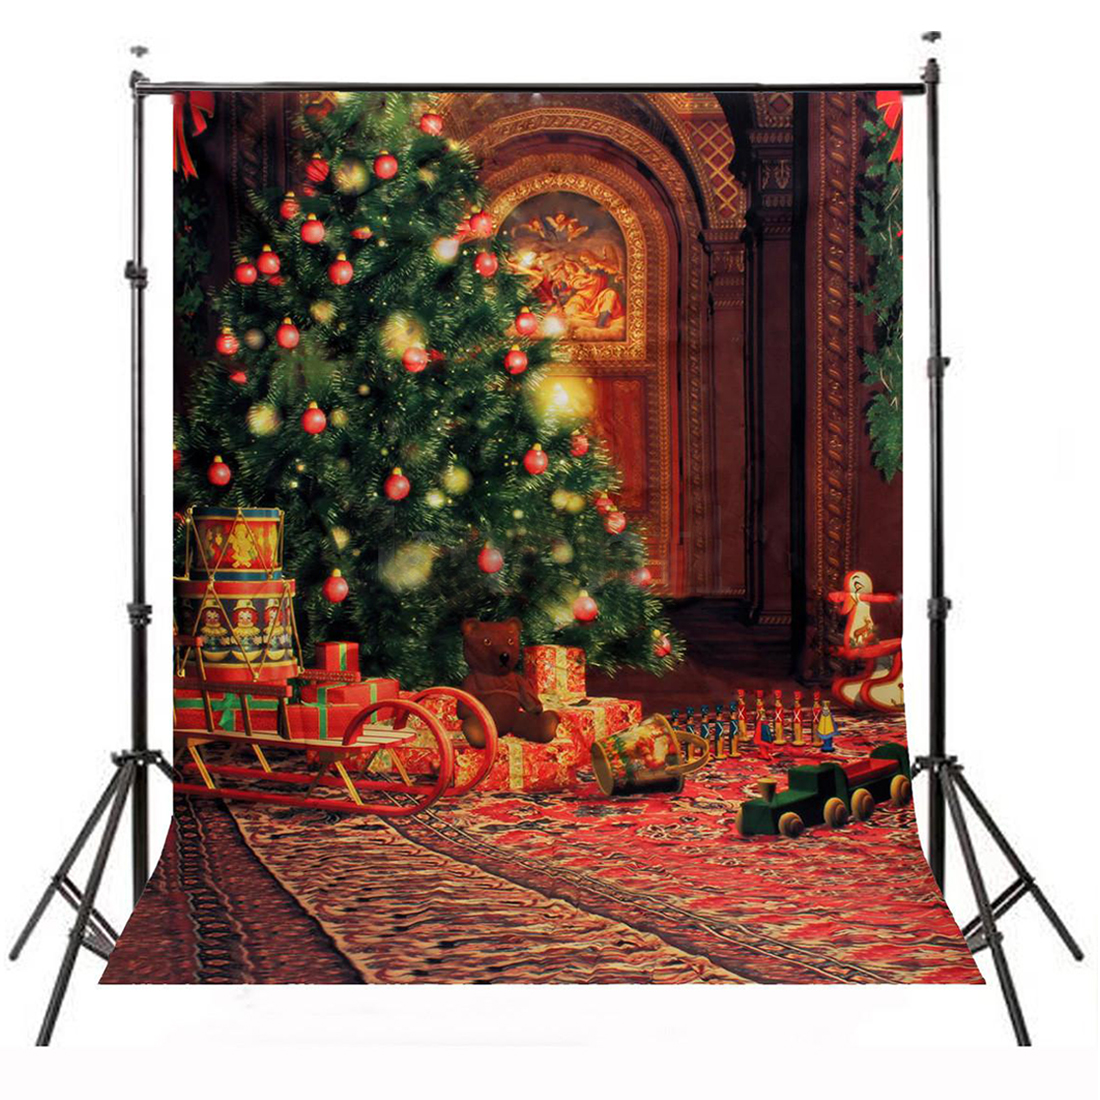 Top Deals 5x7FT Christmas Tree Carpet Photography Backdrop Studio Vinyl Background Props Photo Studio Accessories